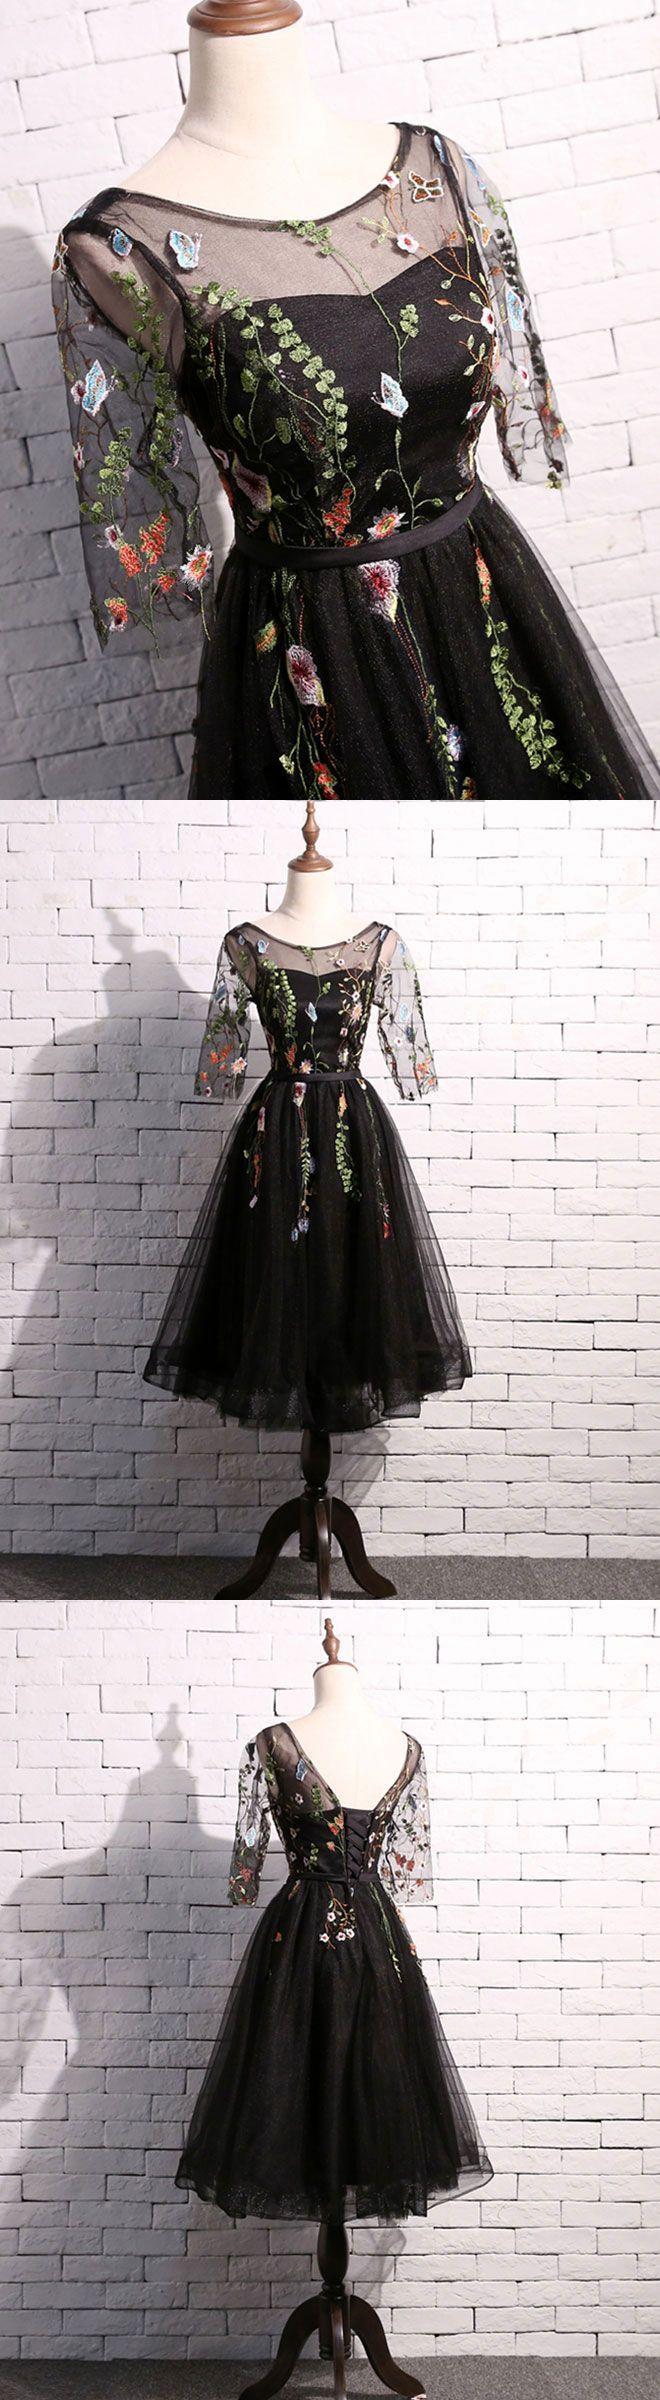 Cute black short prom dress black homecoming dress